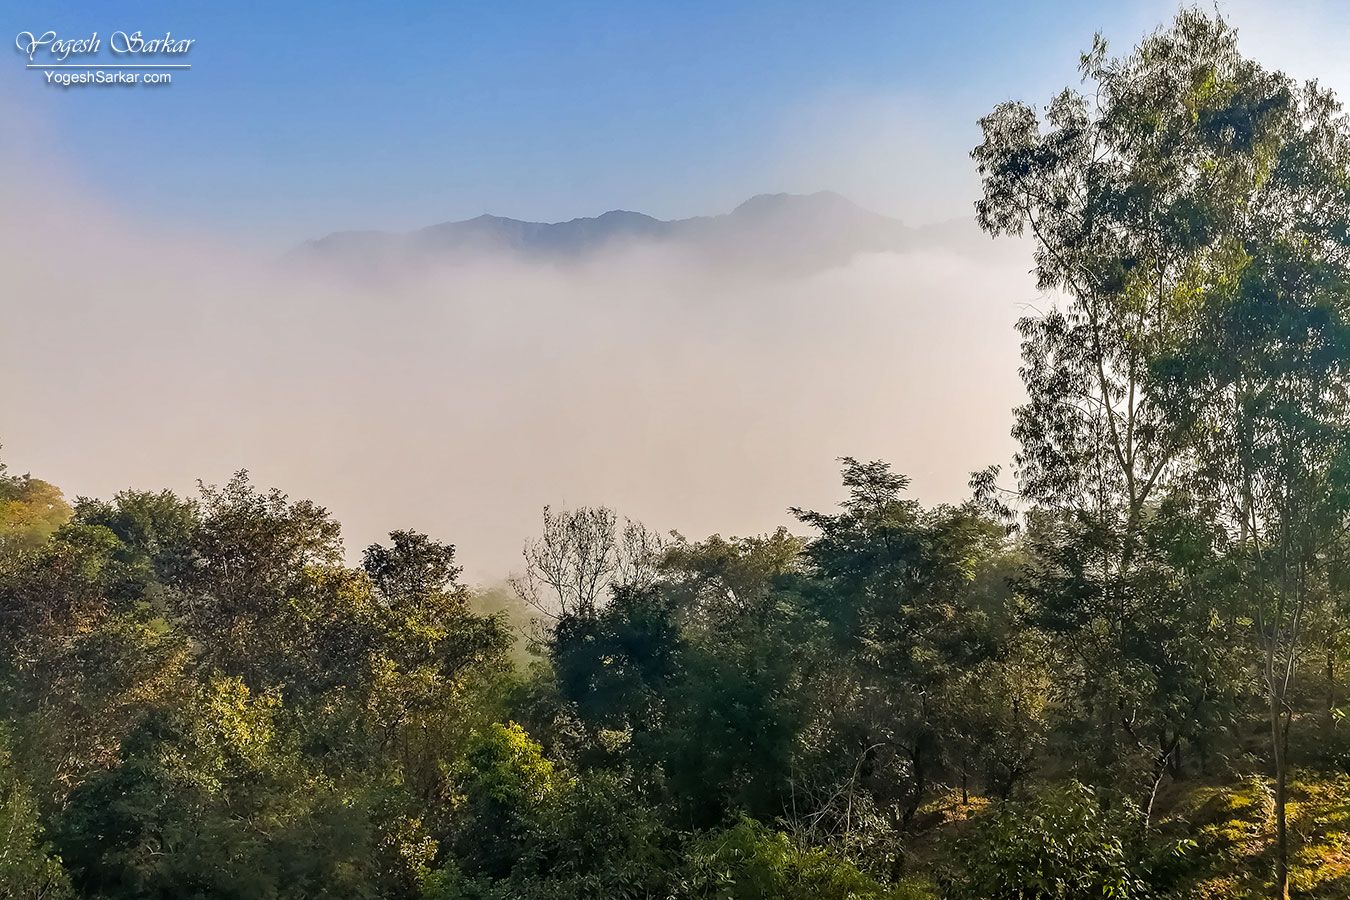 06-foggy-mountains.jpg